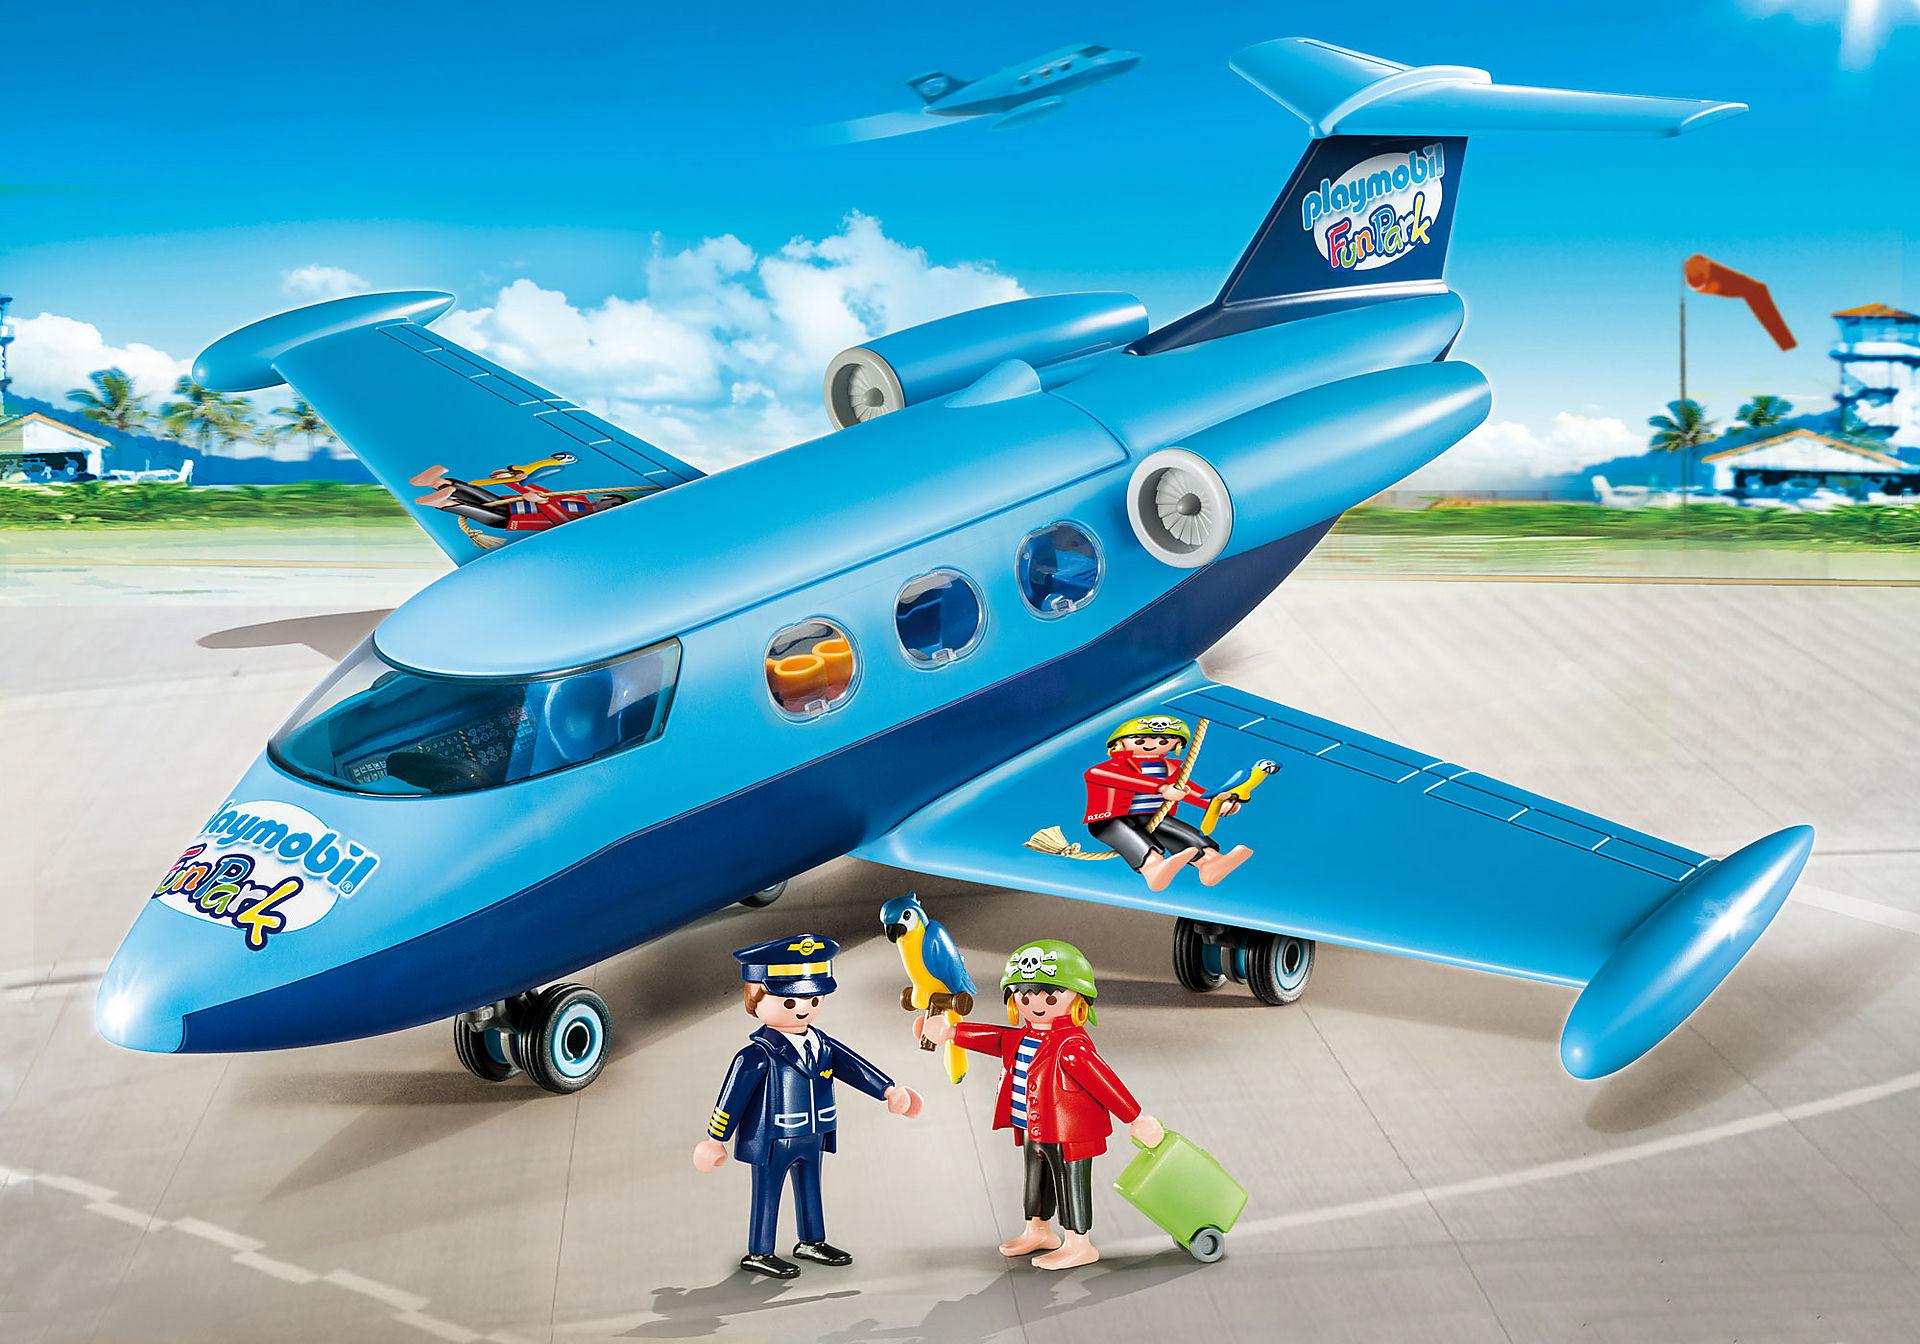 9366 PLAYMOBIL-FunPark Summer Jet zoom image1